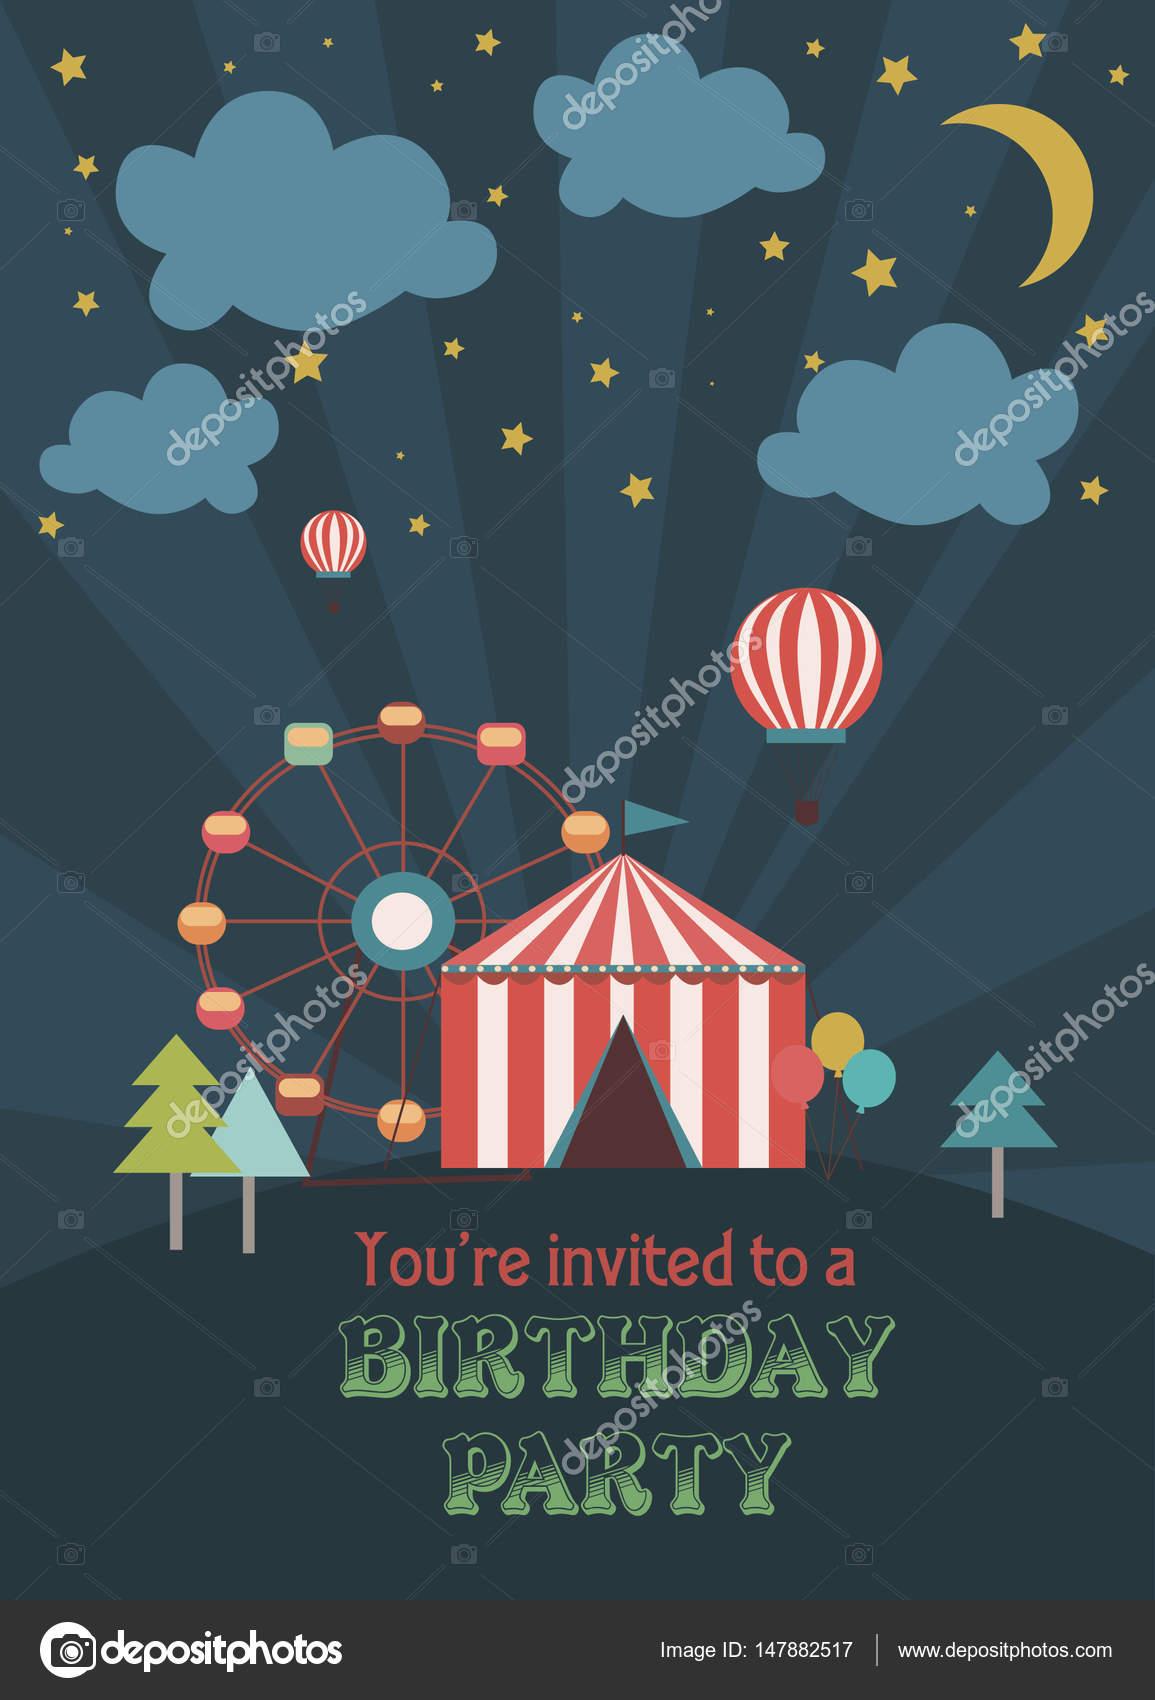 Invitacion Digital Cumpleaños Circo Fiesta Cumpleaños